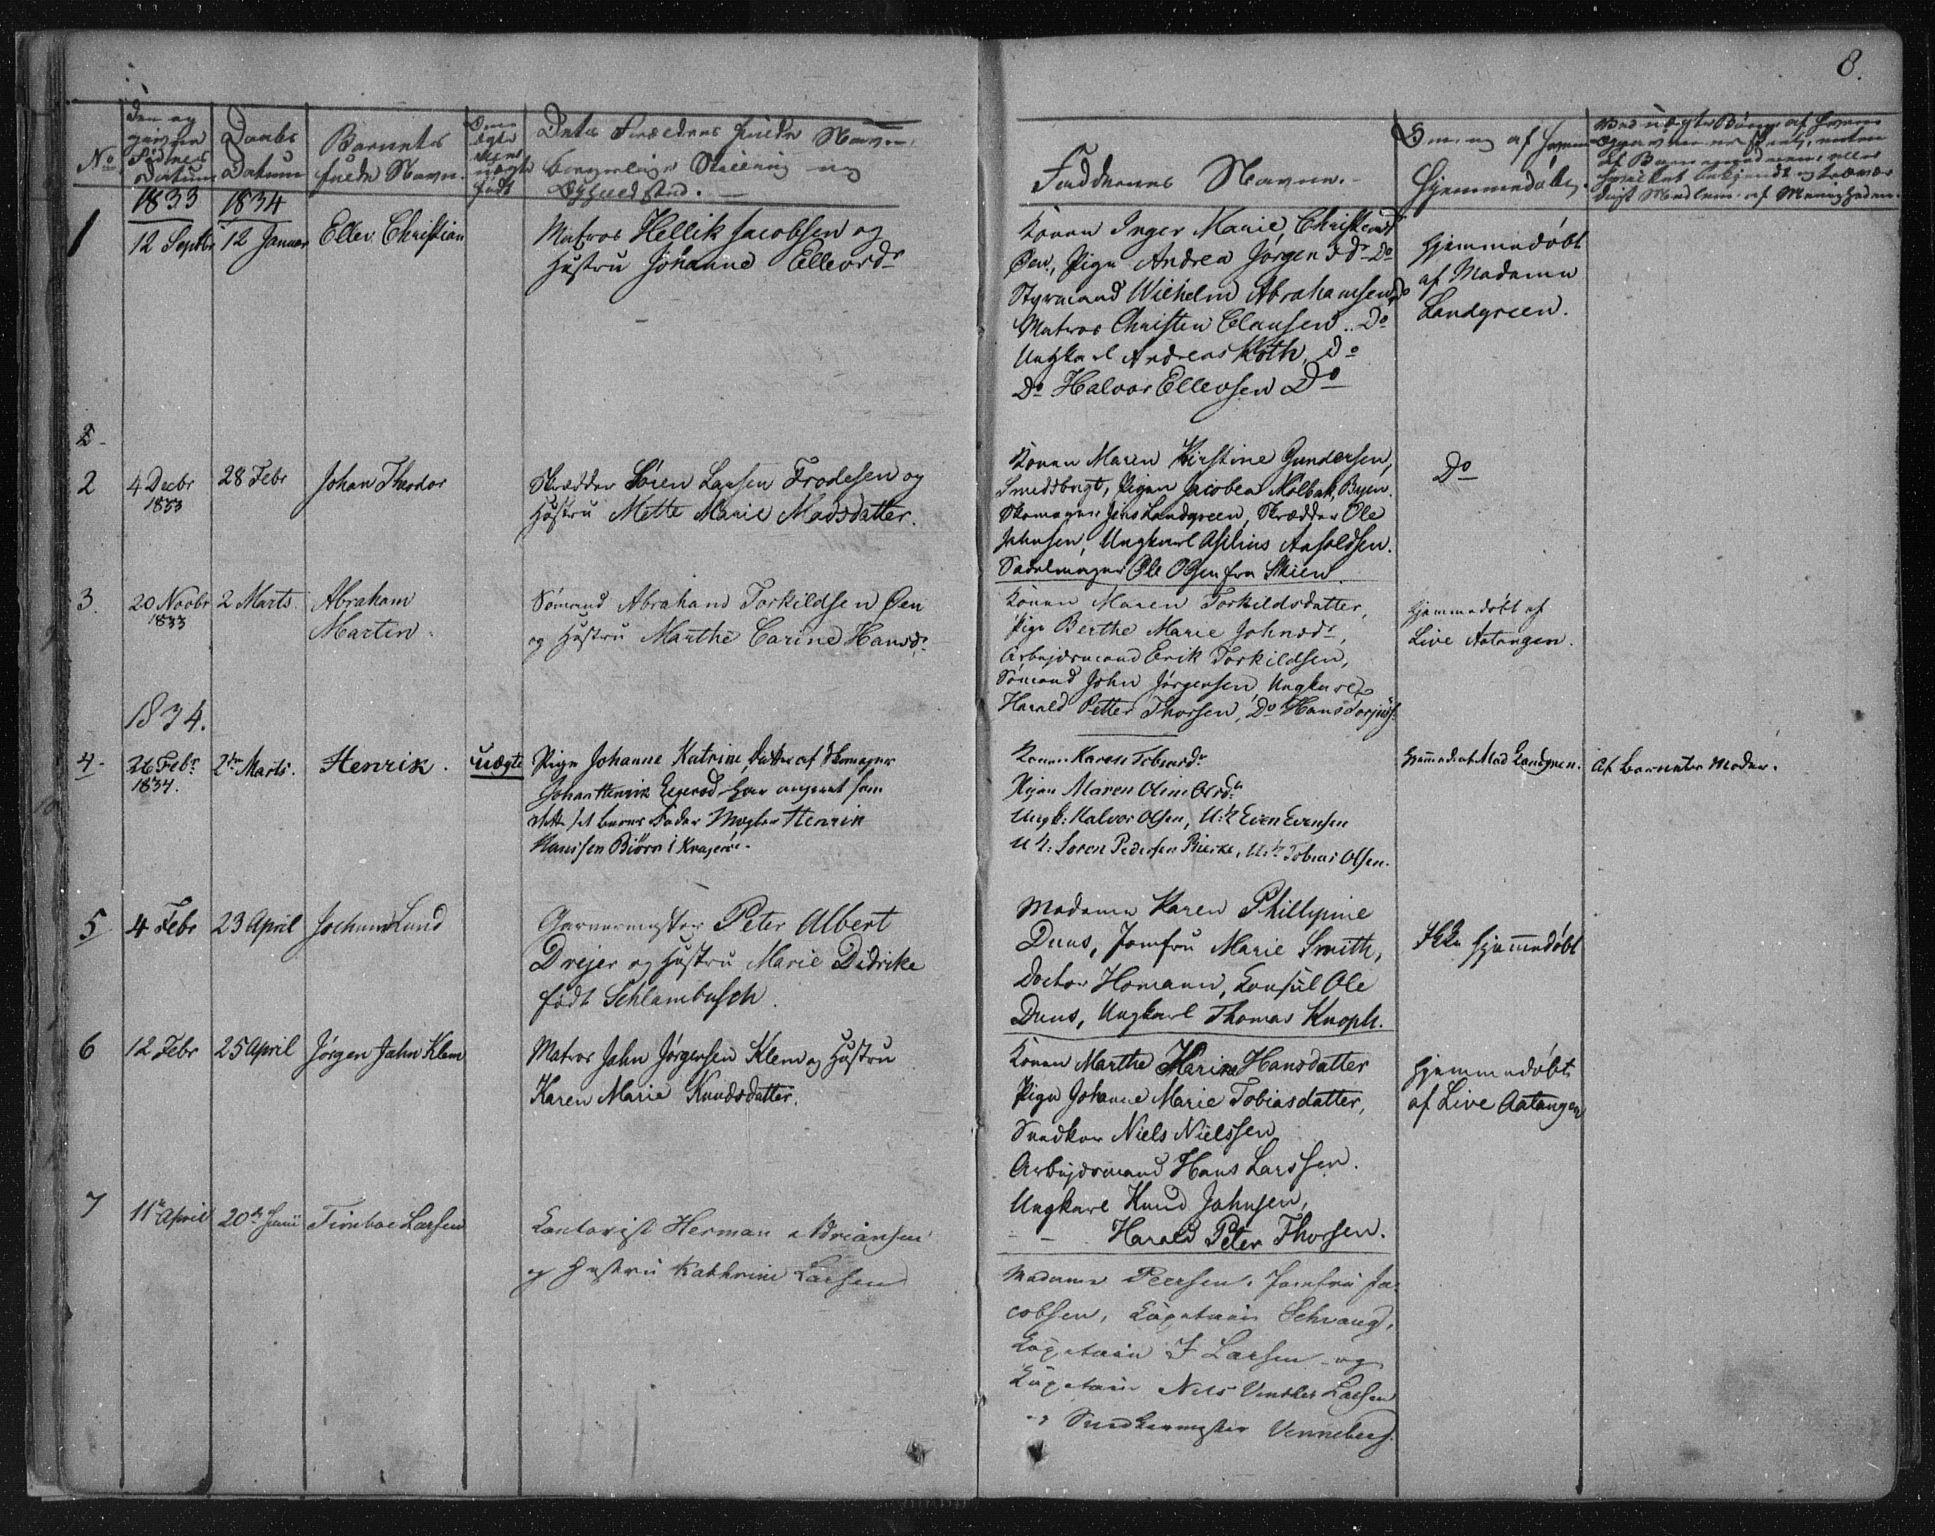 SAKO, Kragerø kirkebøker, F/Fa/L0005: Ministerialbok nr. 5, 1832-1847, s. 8